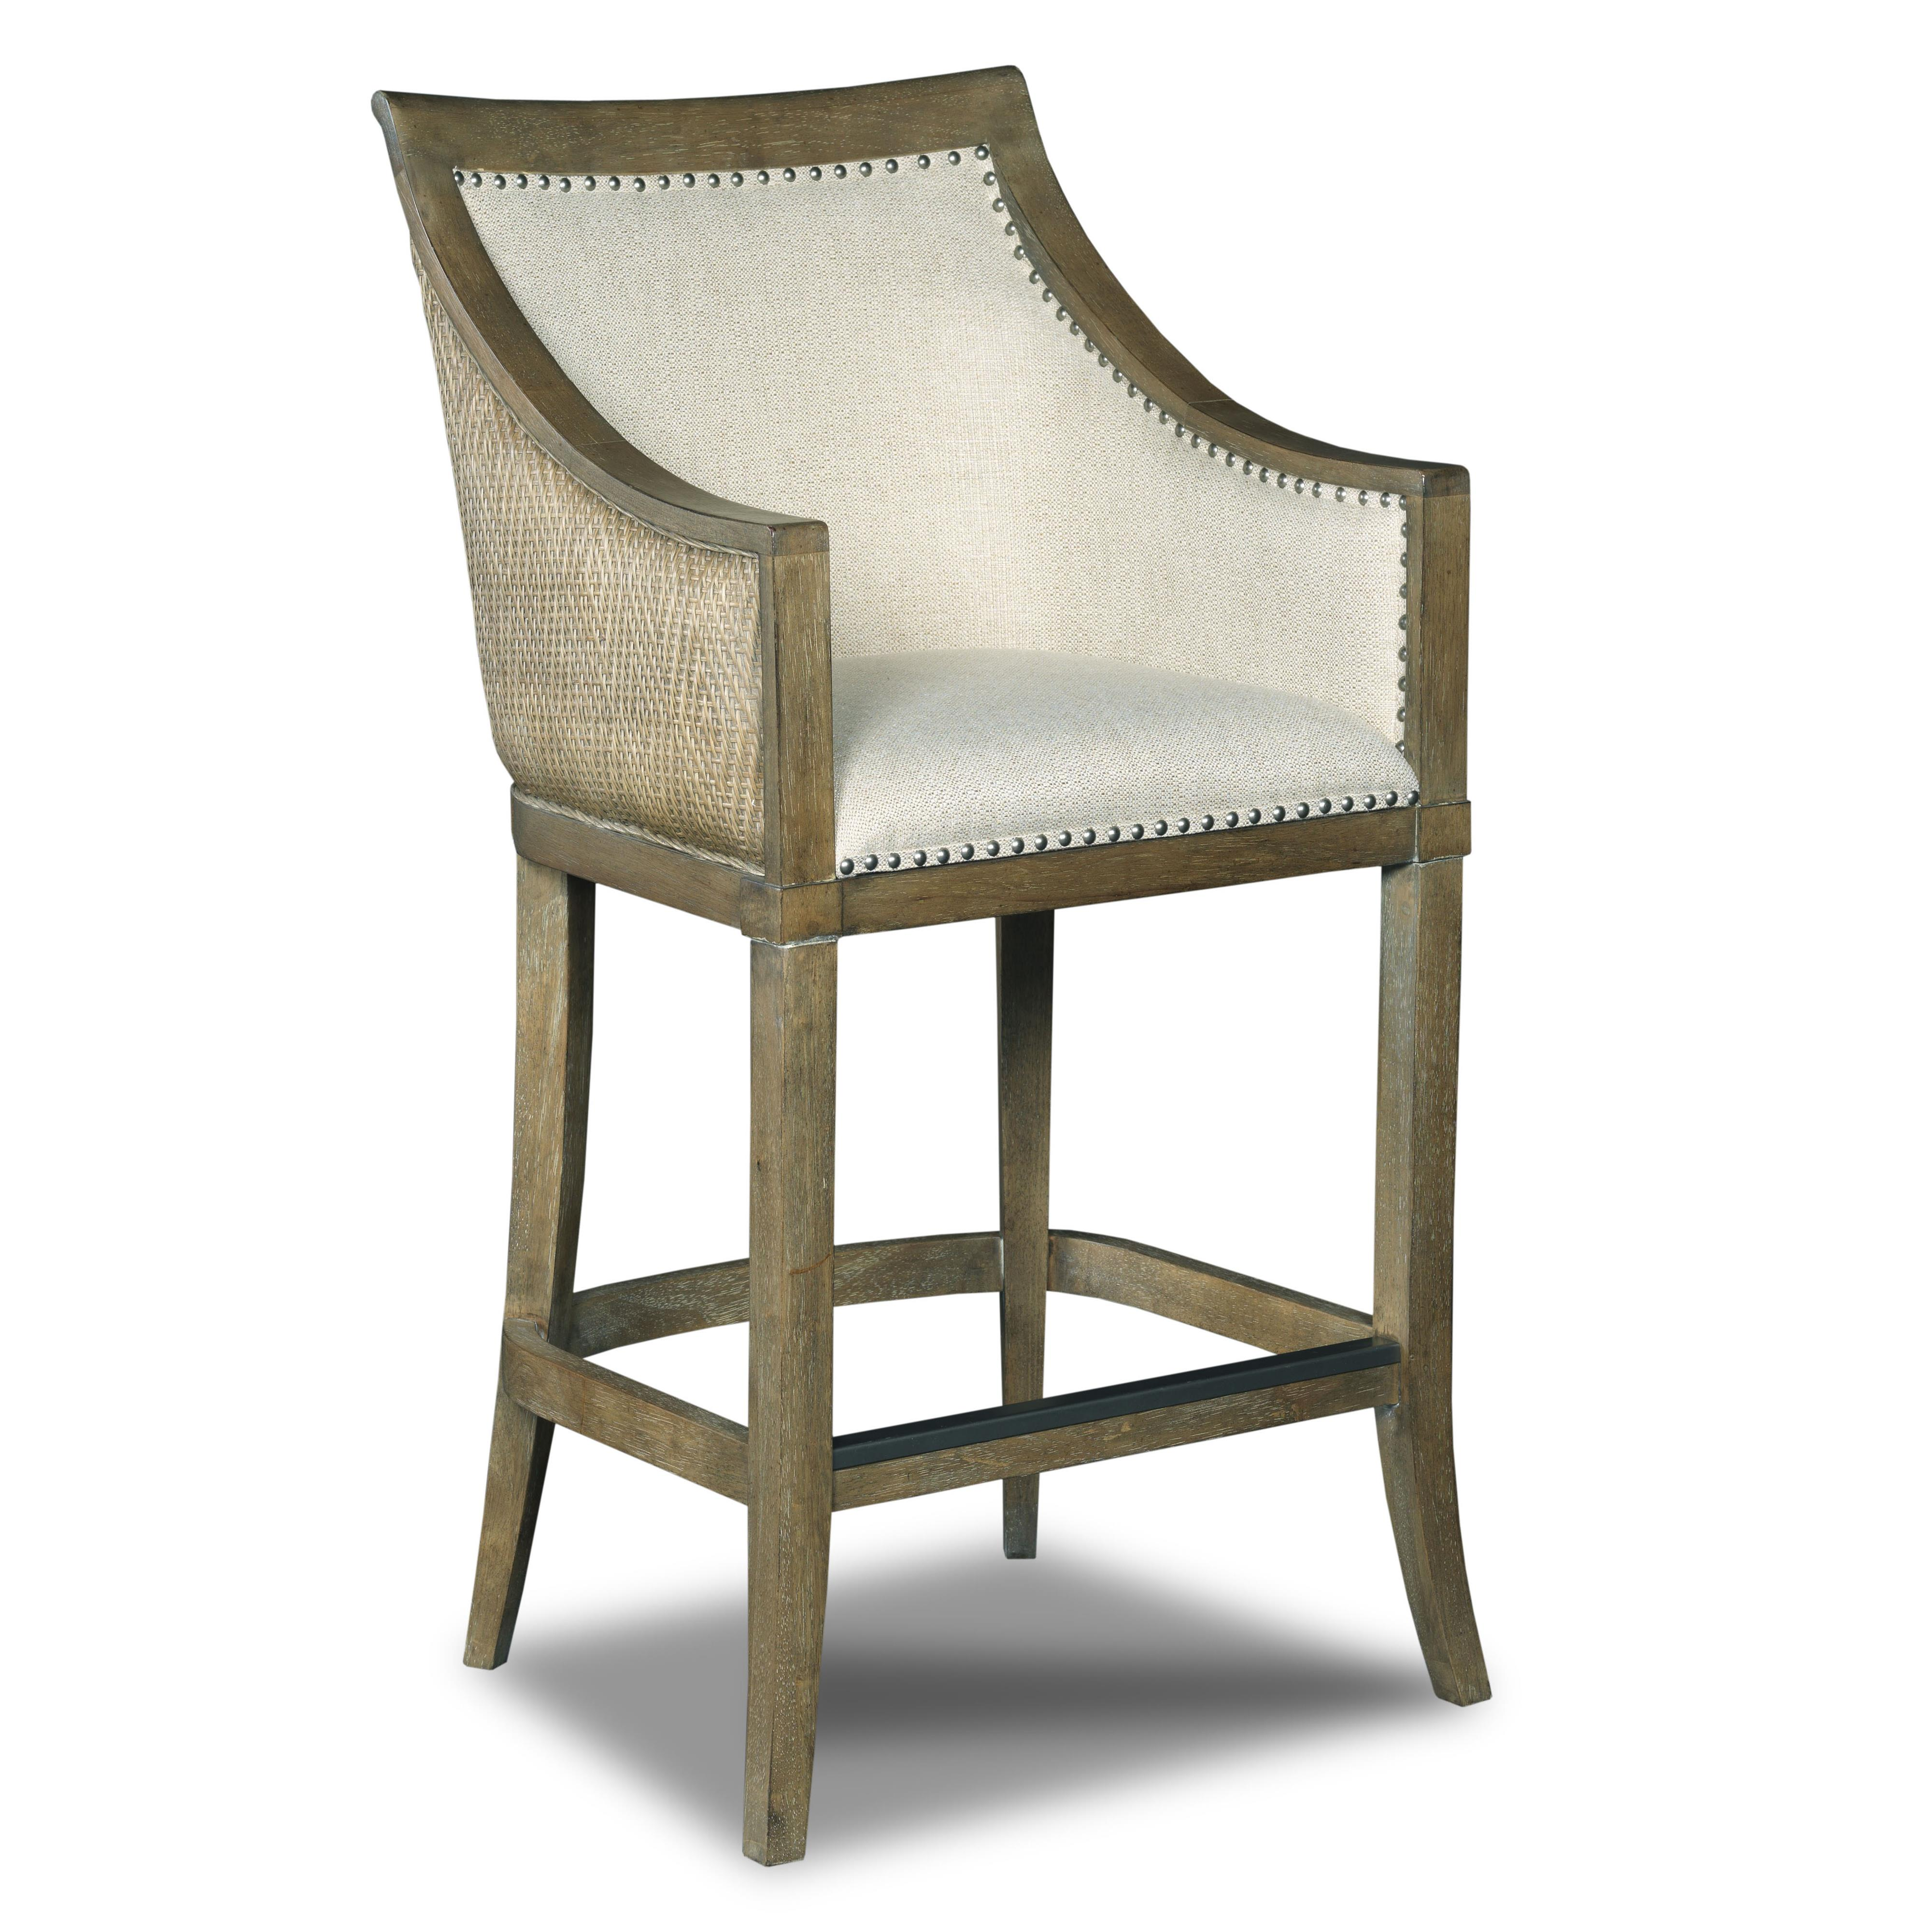 Hooker Furniture Stools Light Sea Breeze - Tropical Barstool - Item Number: 300-20007